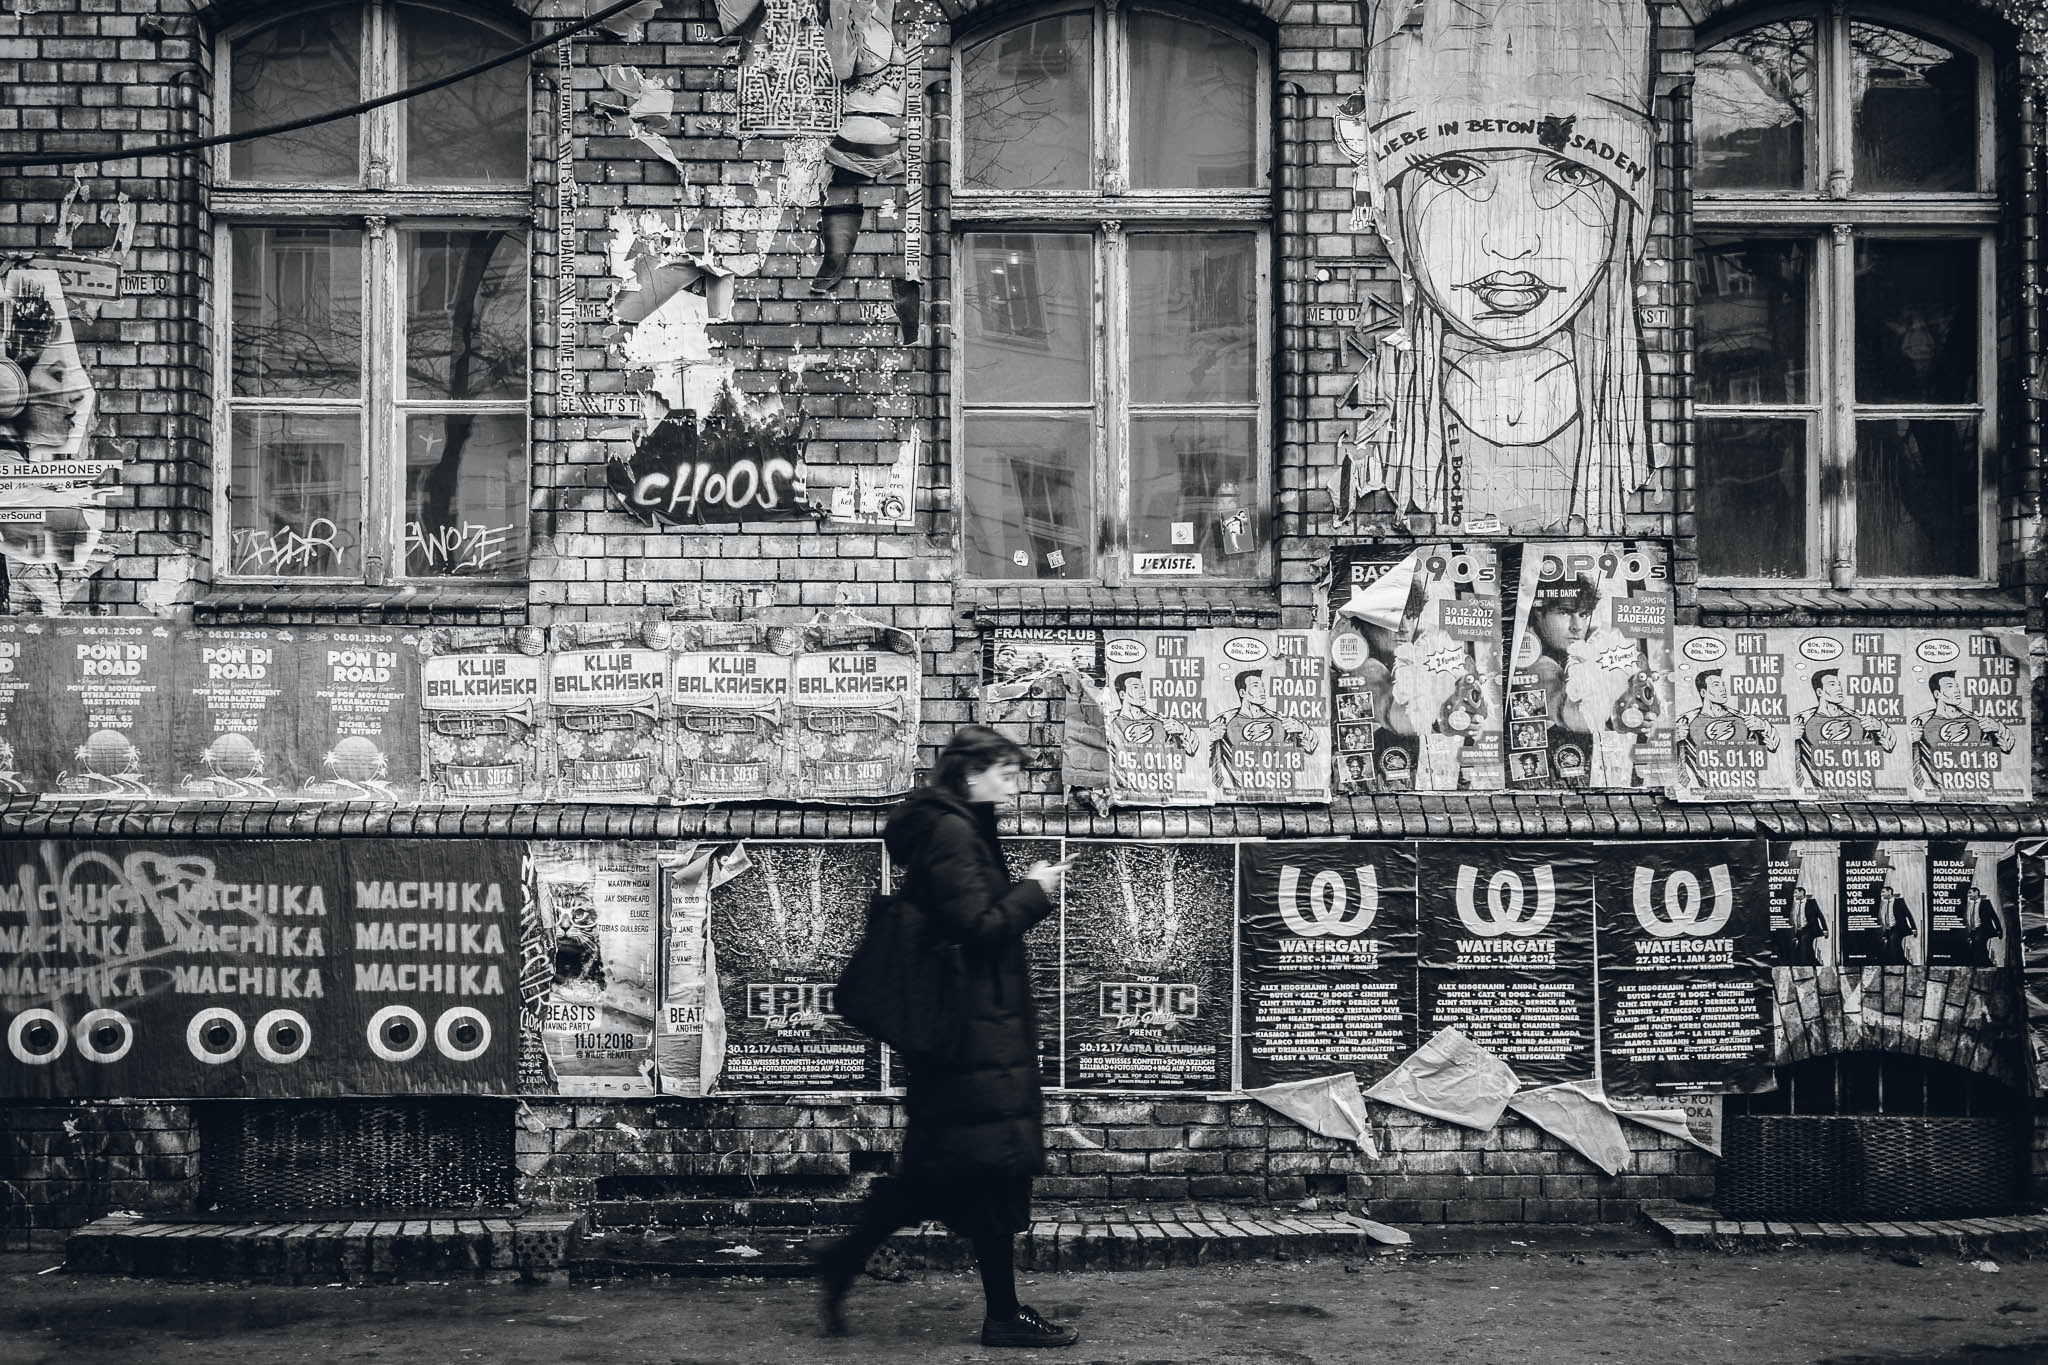 Berlin Street Art 5 by Sebastian Franke